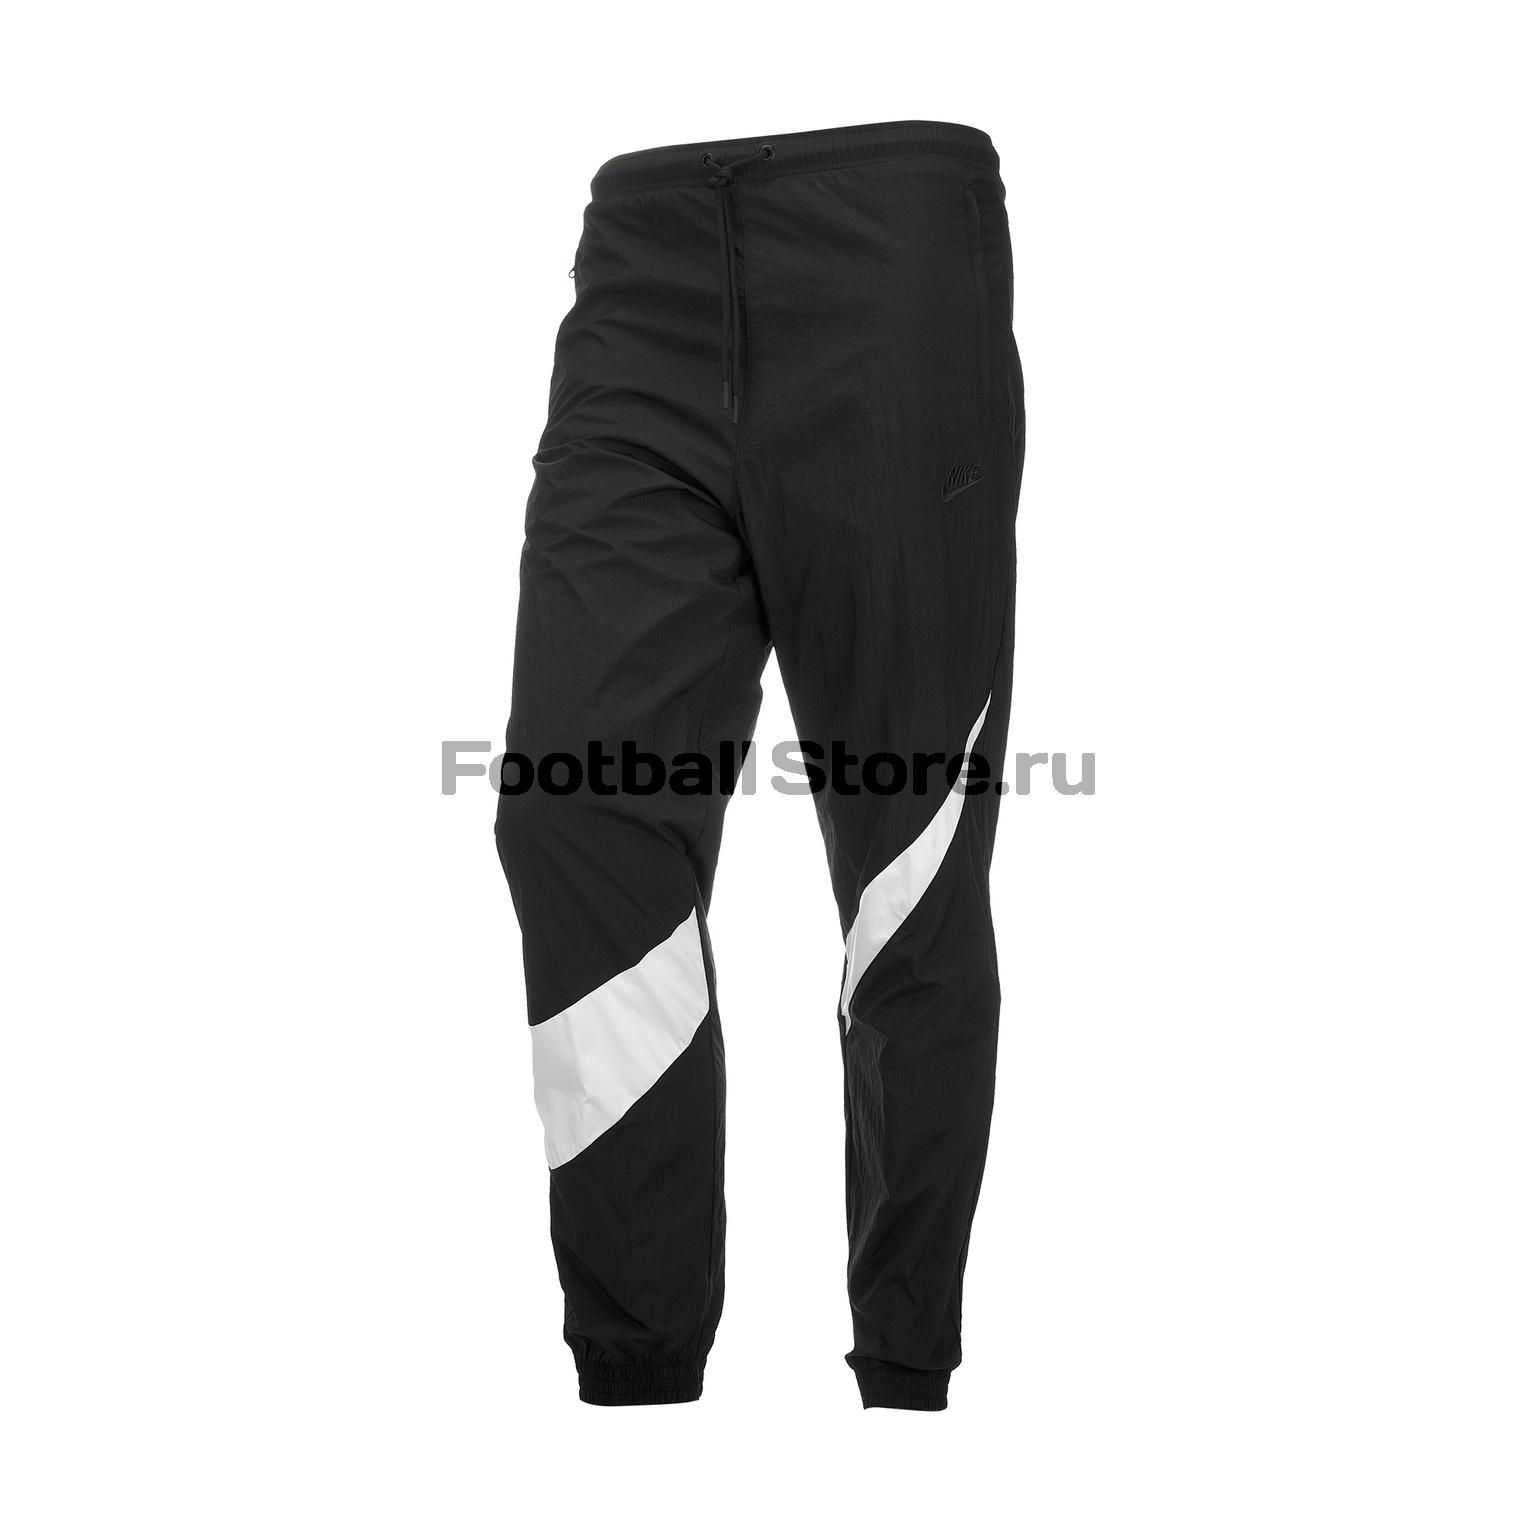 Брюки Nike Pant AR9894-010 nike nike found 12 poly pant boys 476747 010